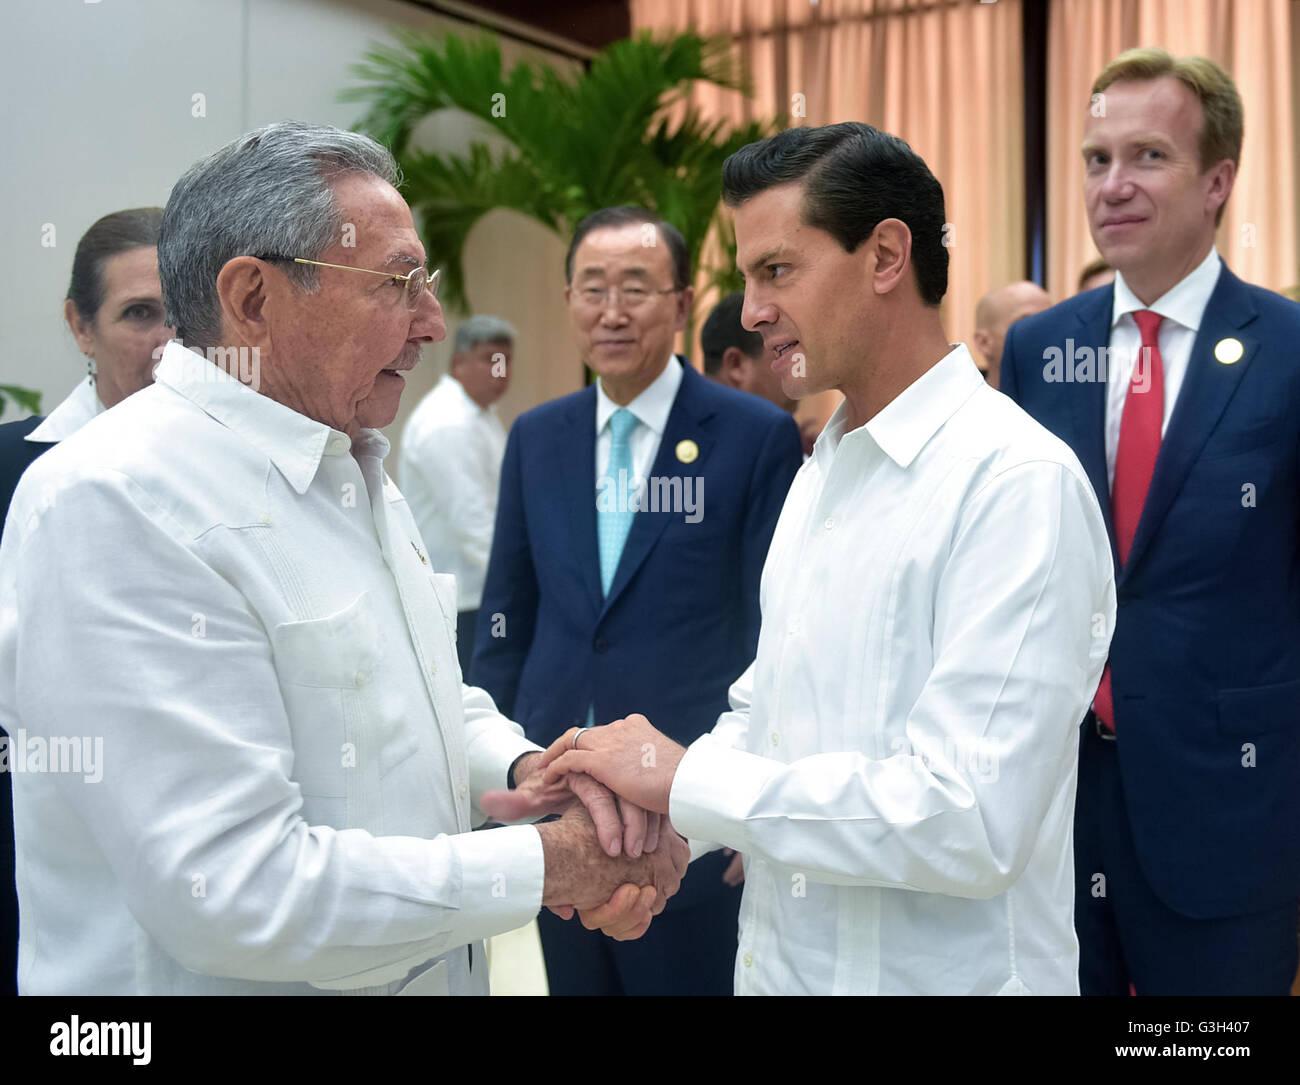 Mexican President Enrique Pena Nieto Shakes Hands With Cuban Leader